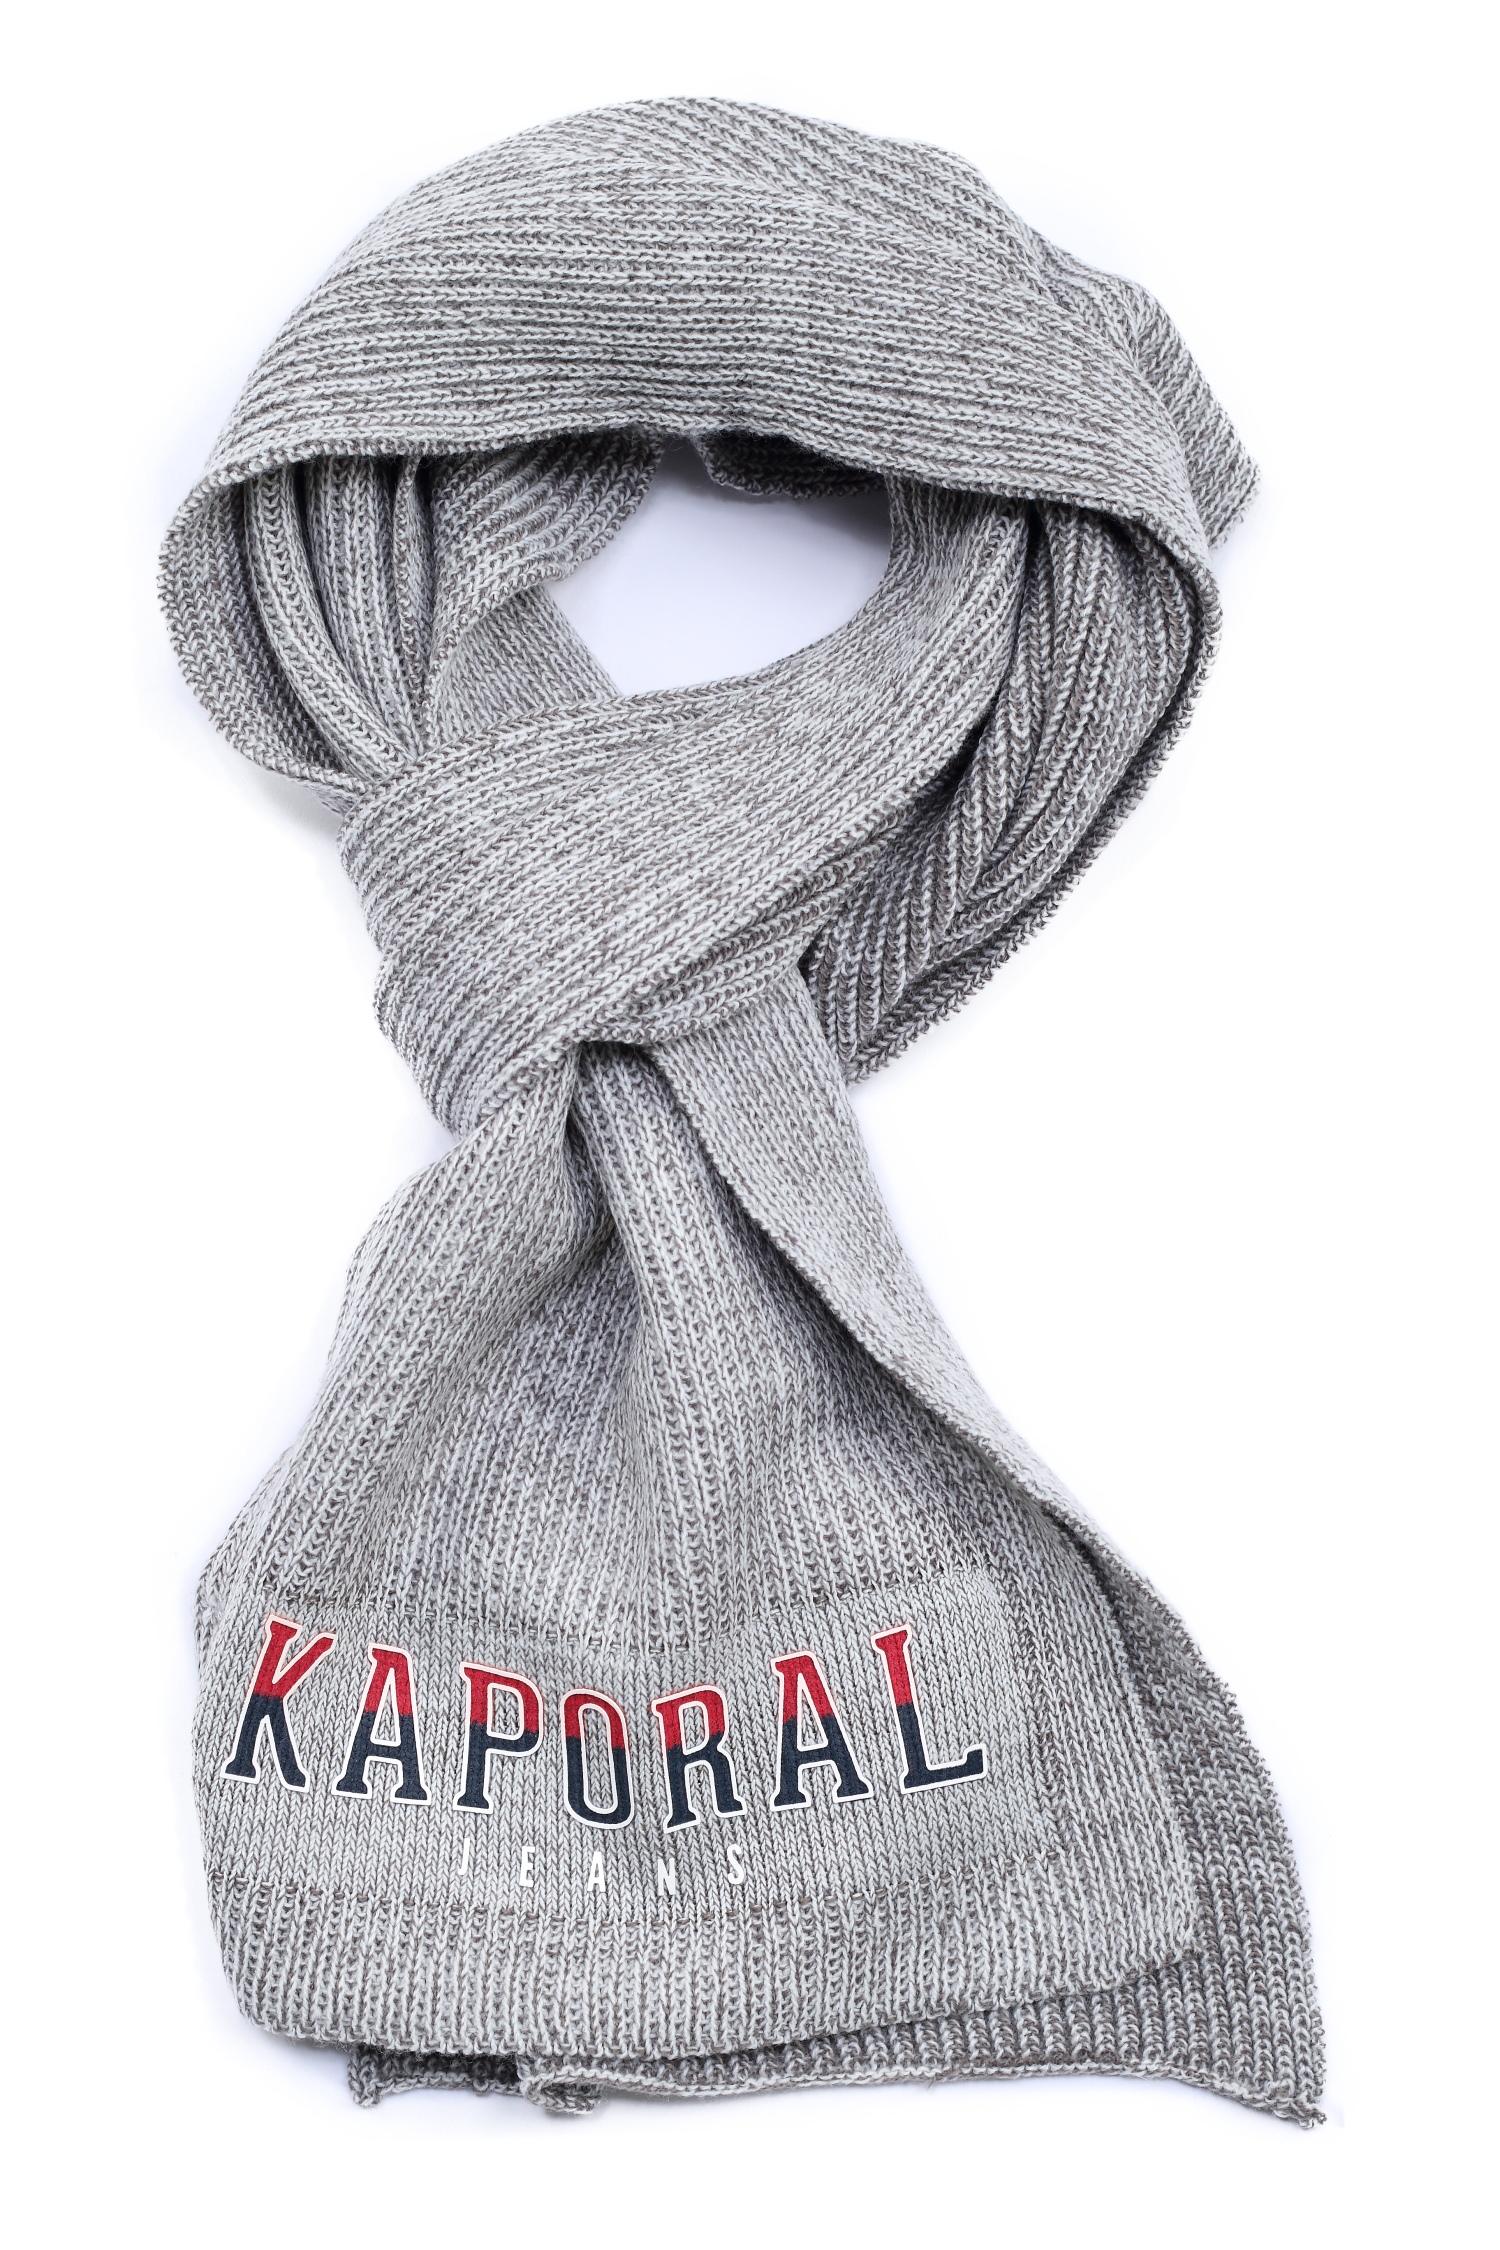 https://www.leadermode.com/180151/kaporal-bilik-medium-grey-mel.jpg